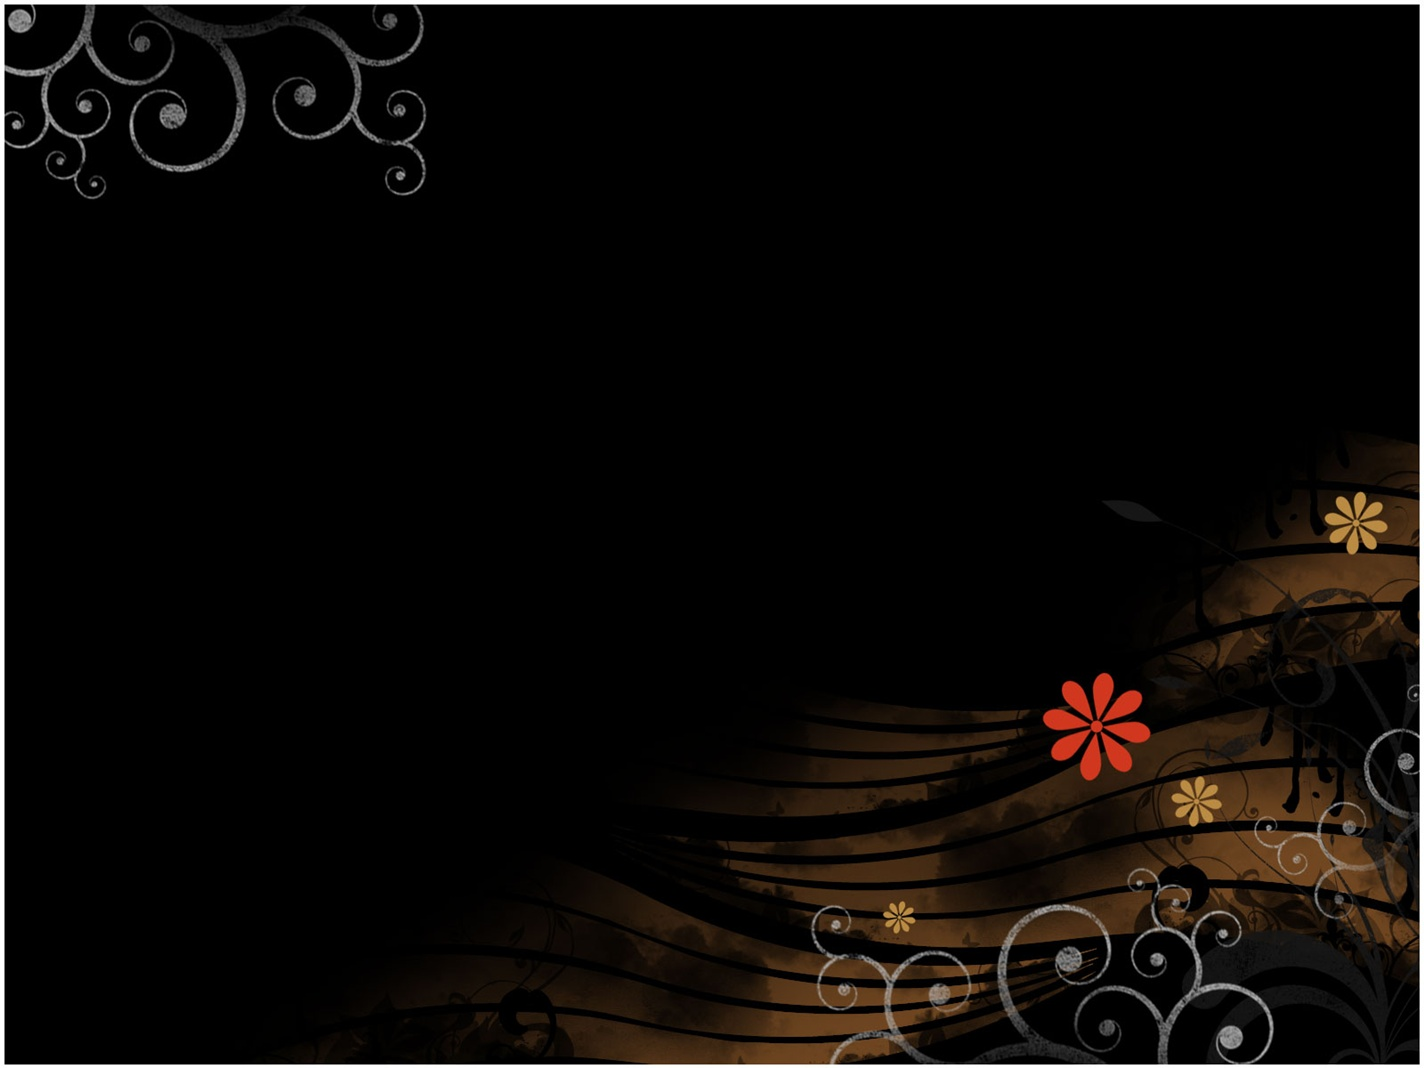 Desktop Animated Wallpaper for Mac 1424x1068